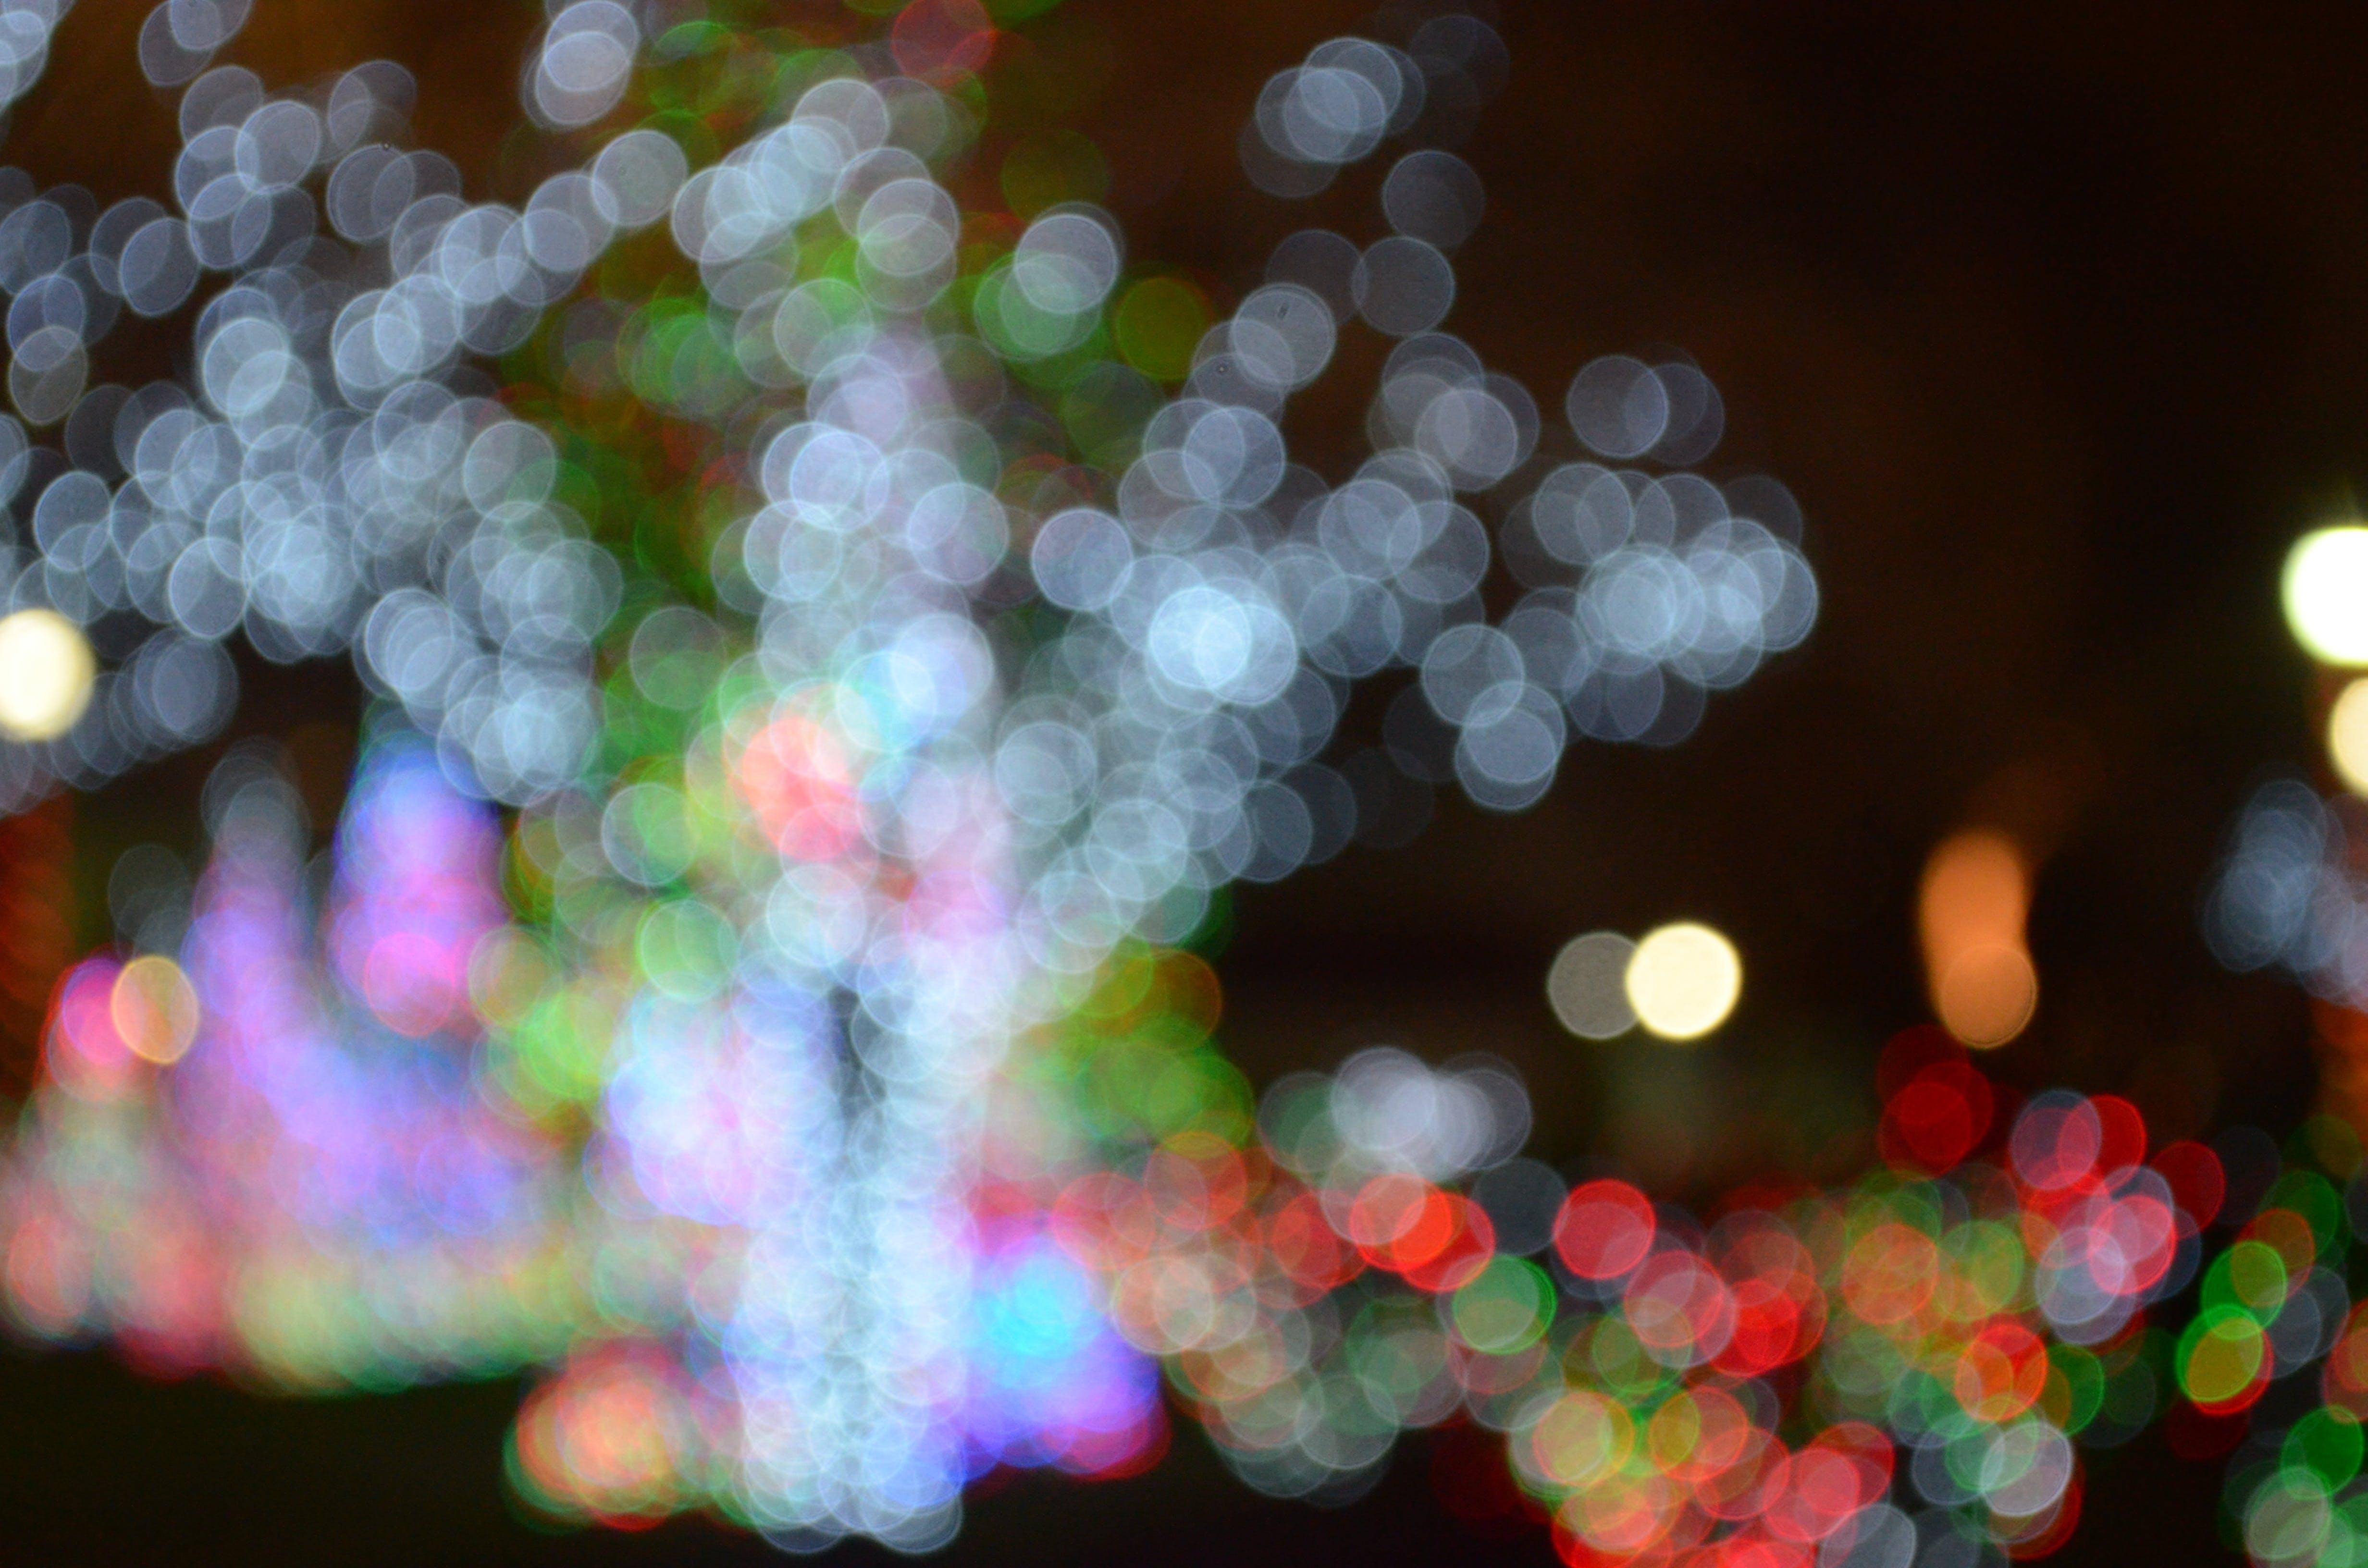 Multicolored Bokeh Light Photography